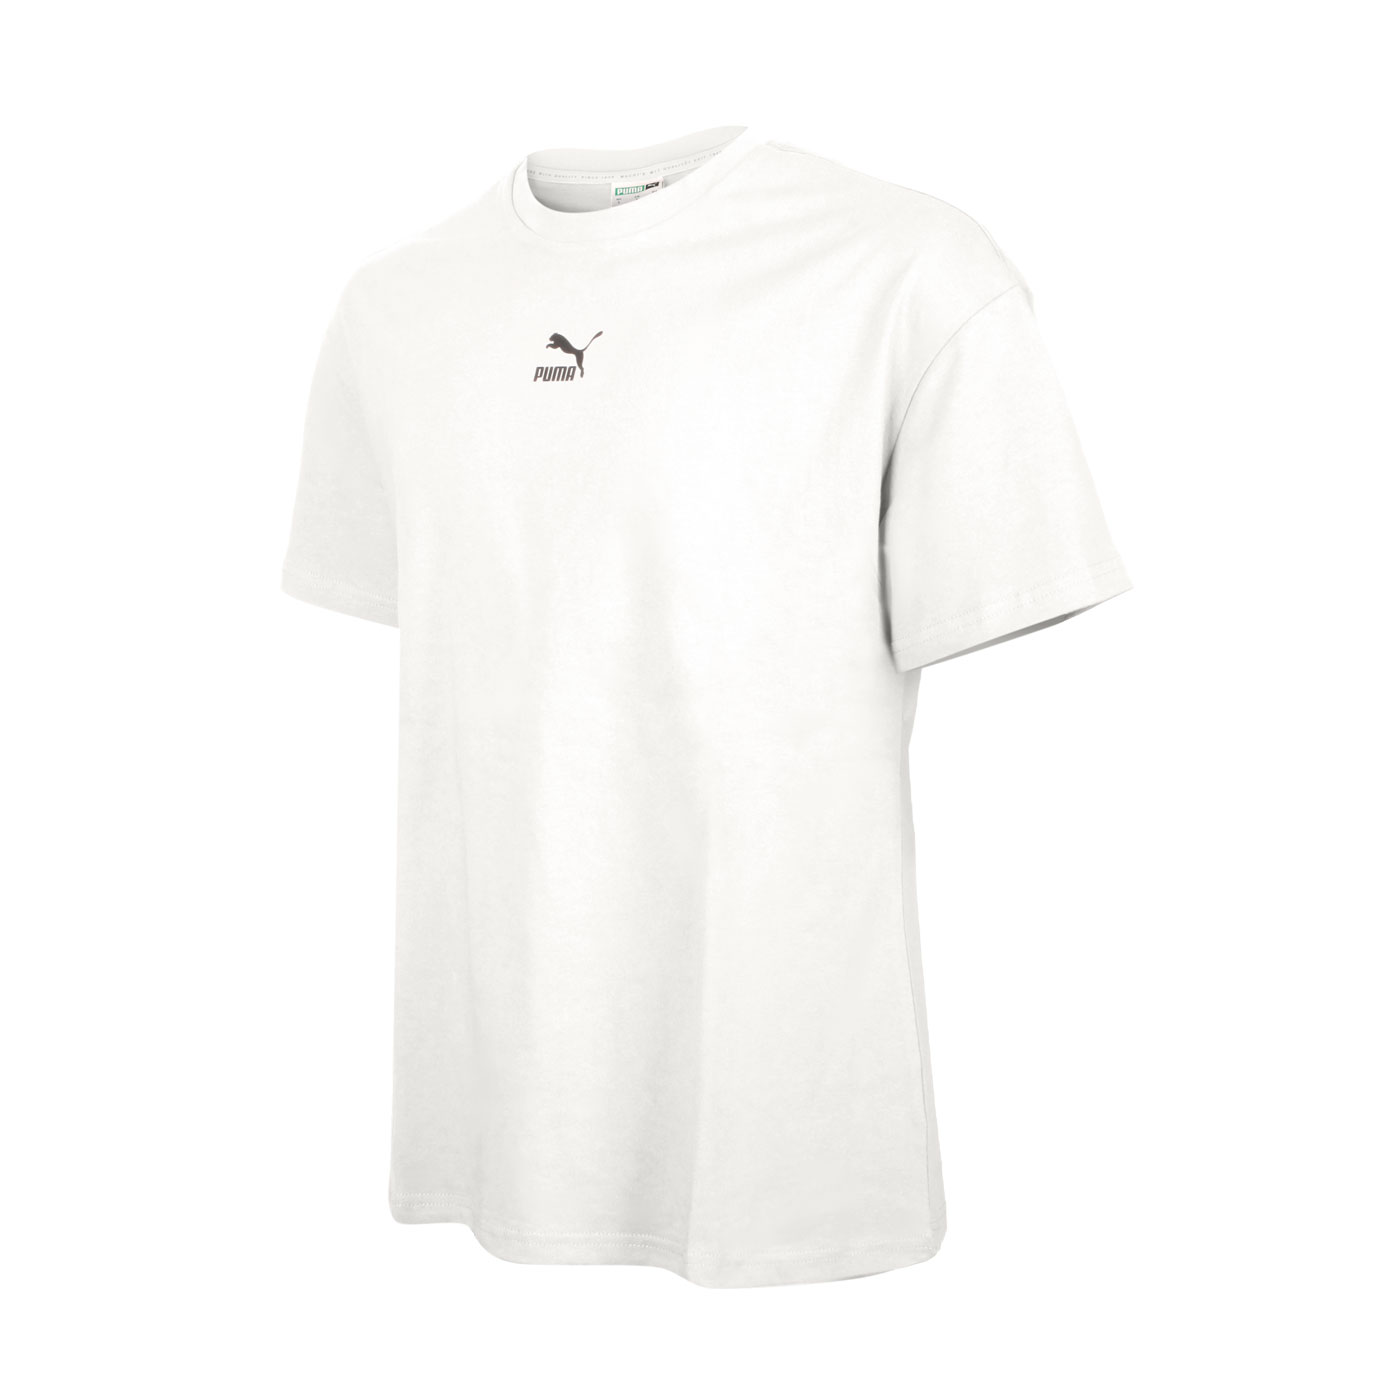 PUMA 男款流行系列Classics寬鬆短袖T恤 53213573 - 米白黑